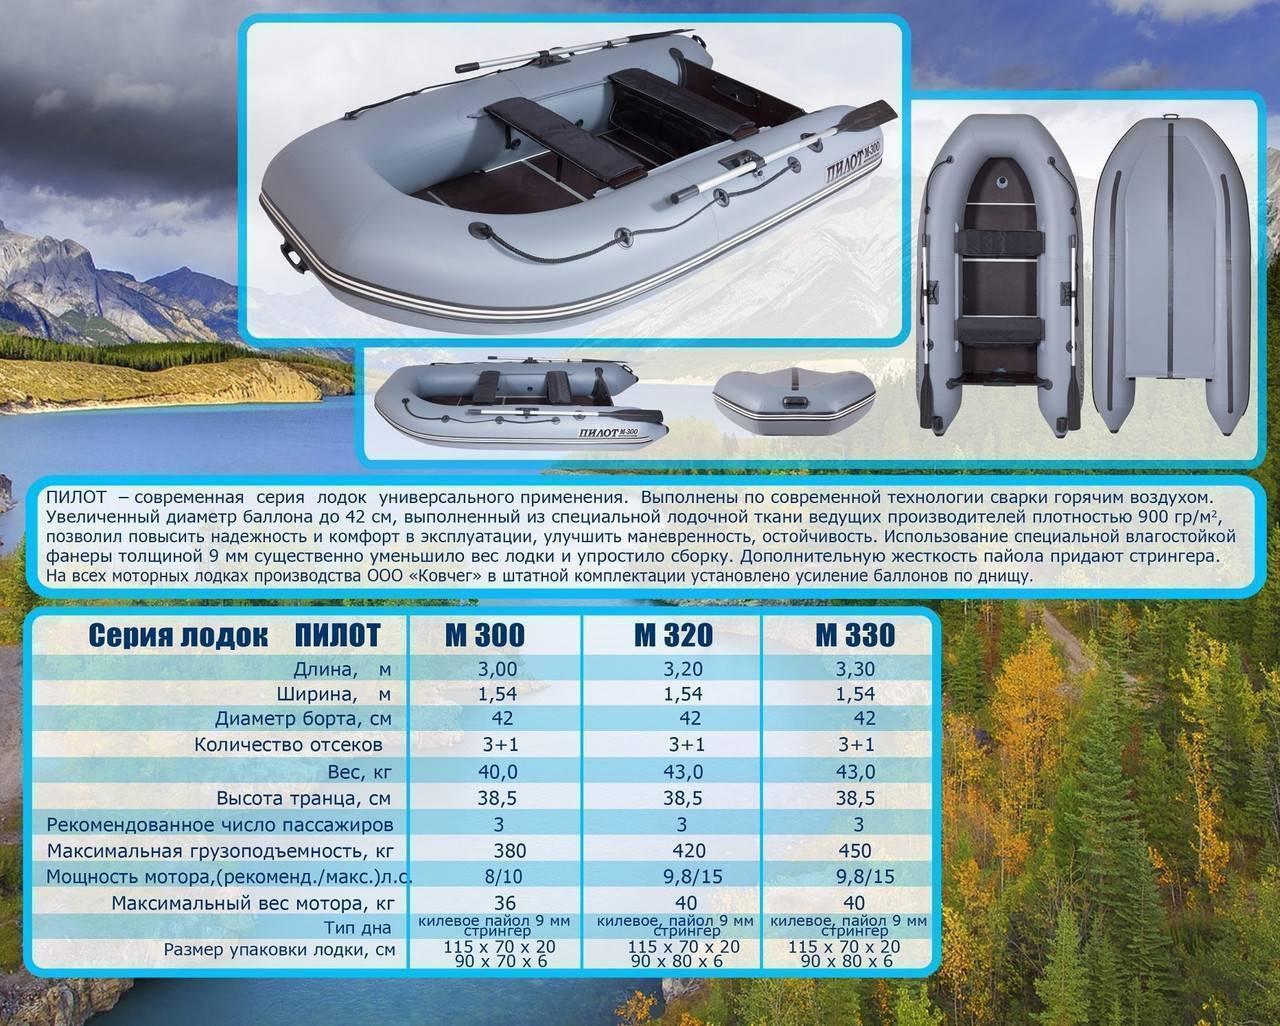 Лодки пвх киль - характеристики, модели, правила эксплуатации